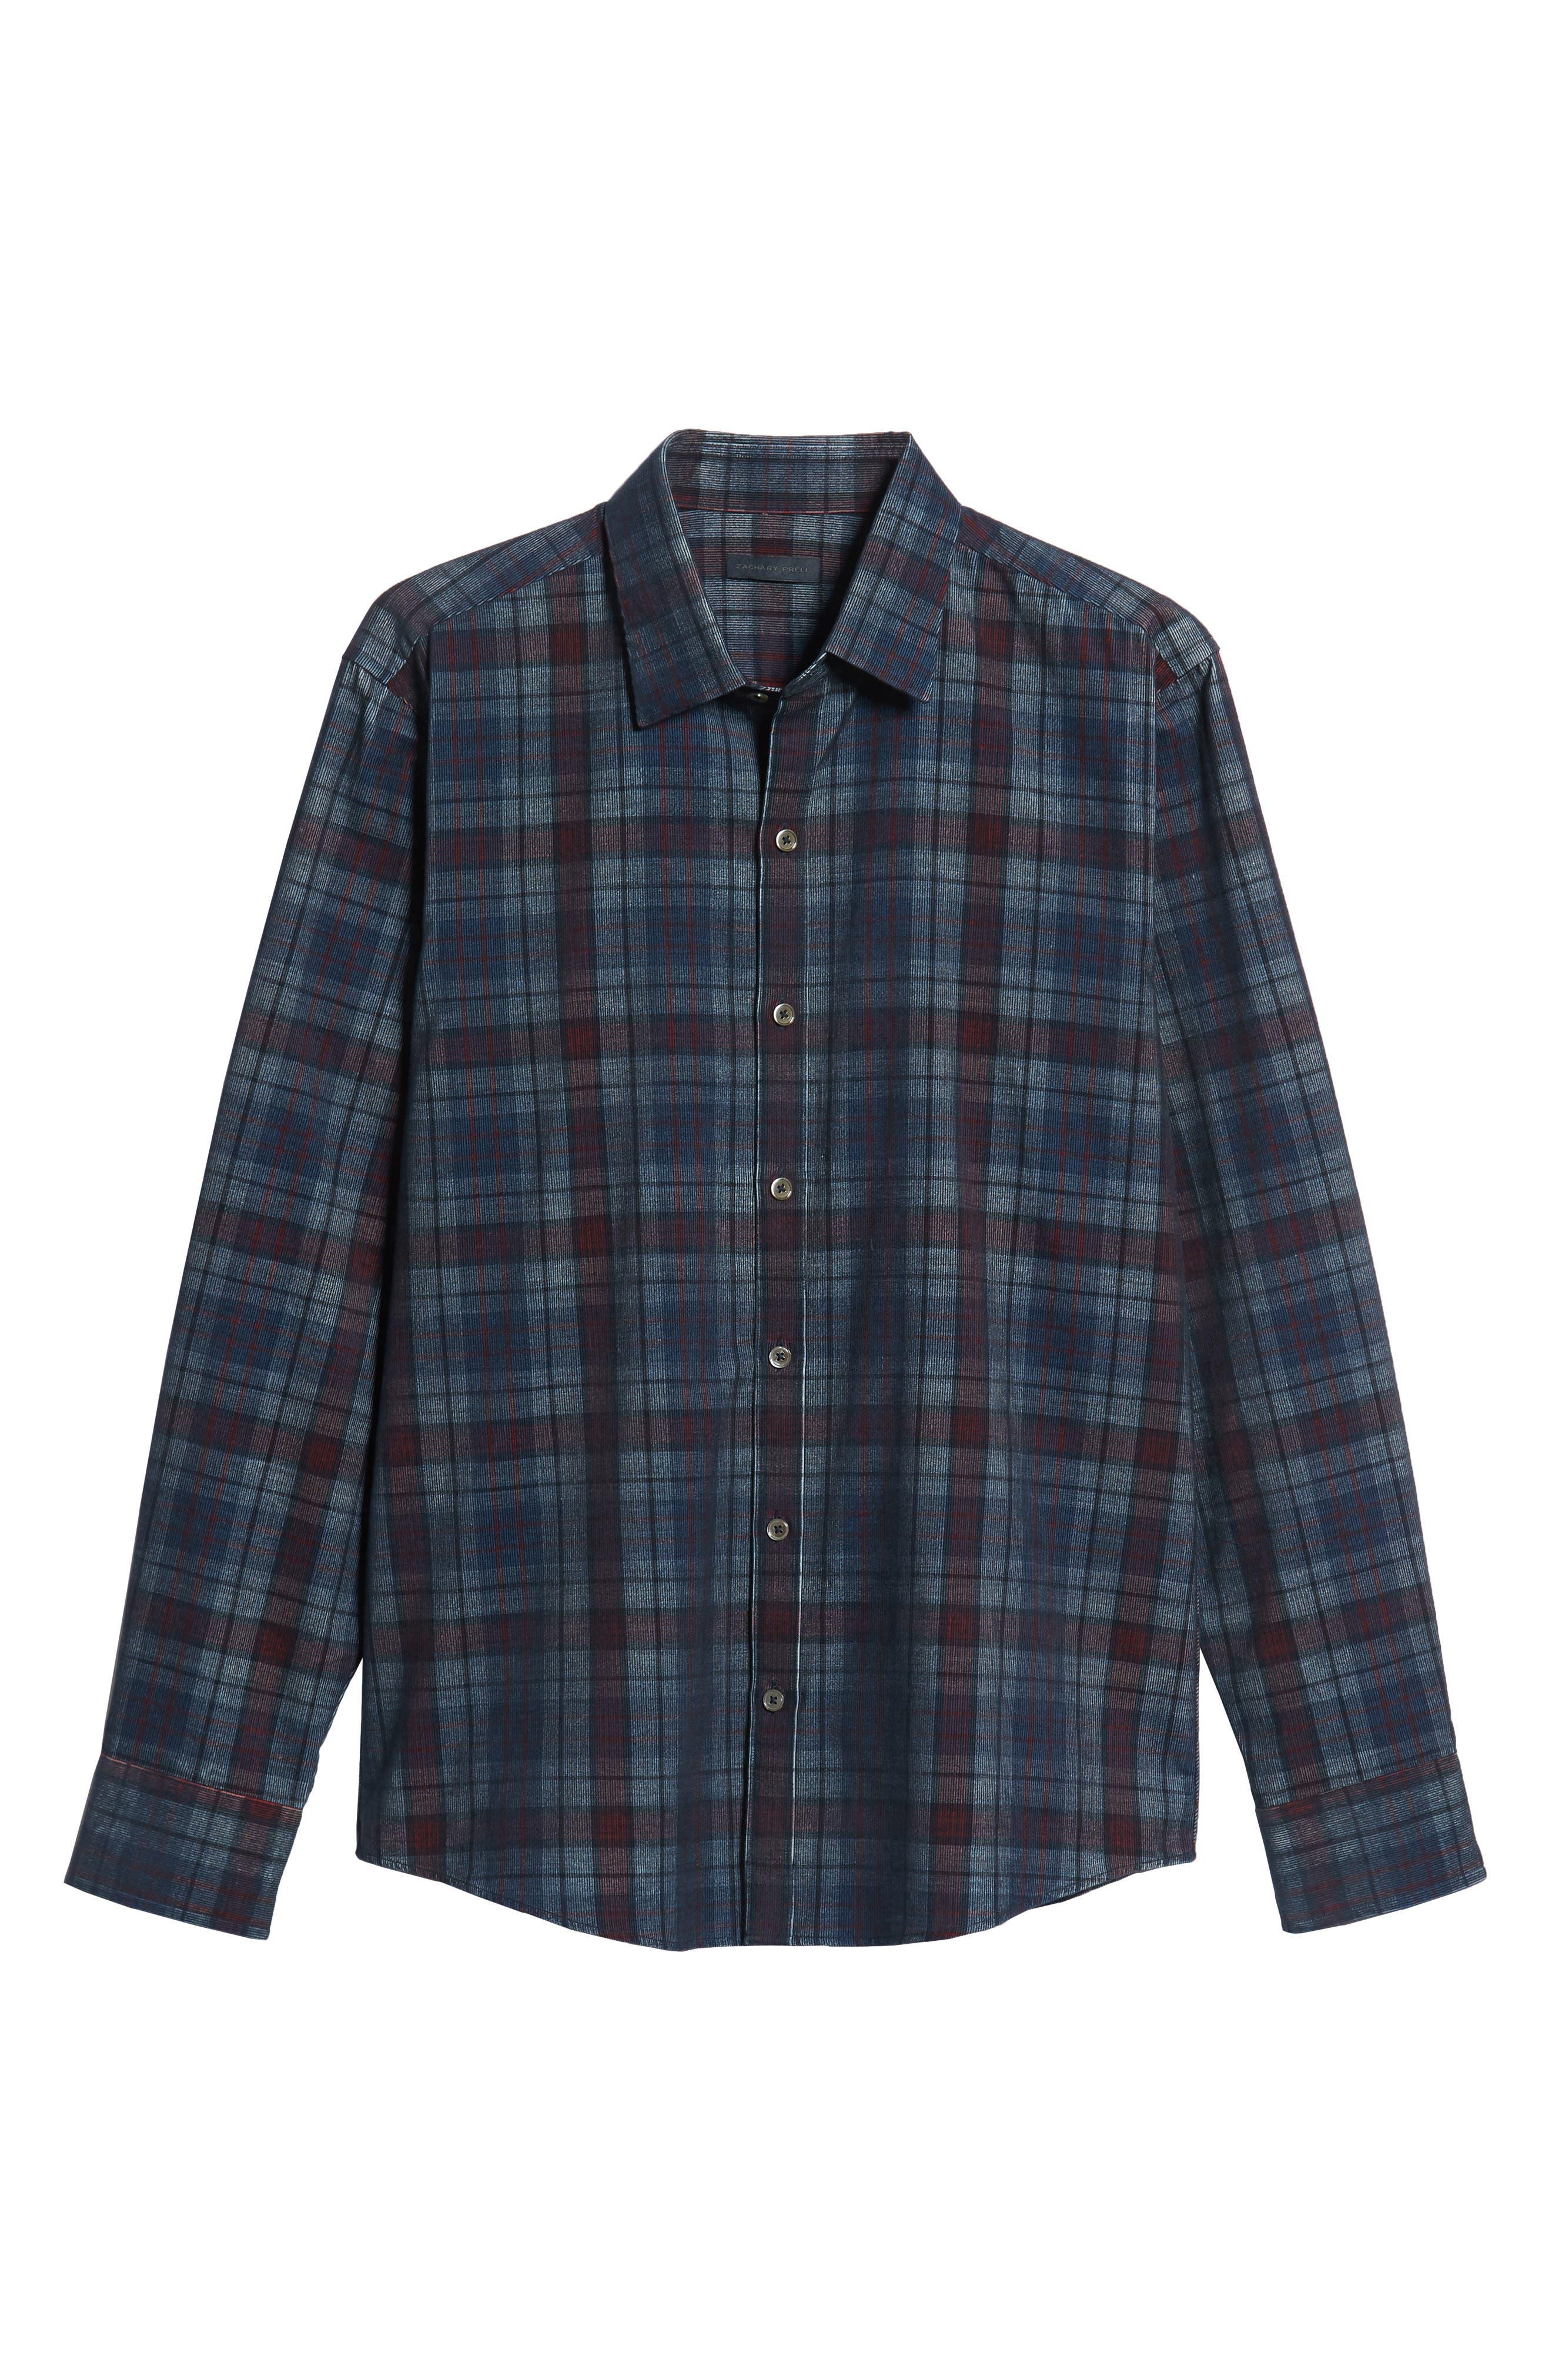 Lemke Regular Fit Corduroy Sport Shirt,                             Alternate thumbnail 5, color,                             NAVY